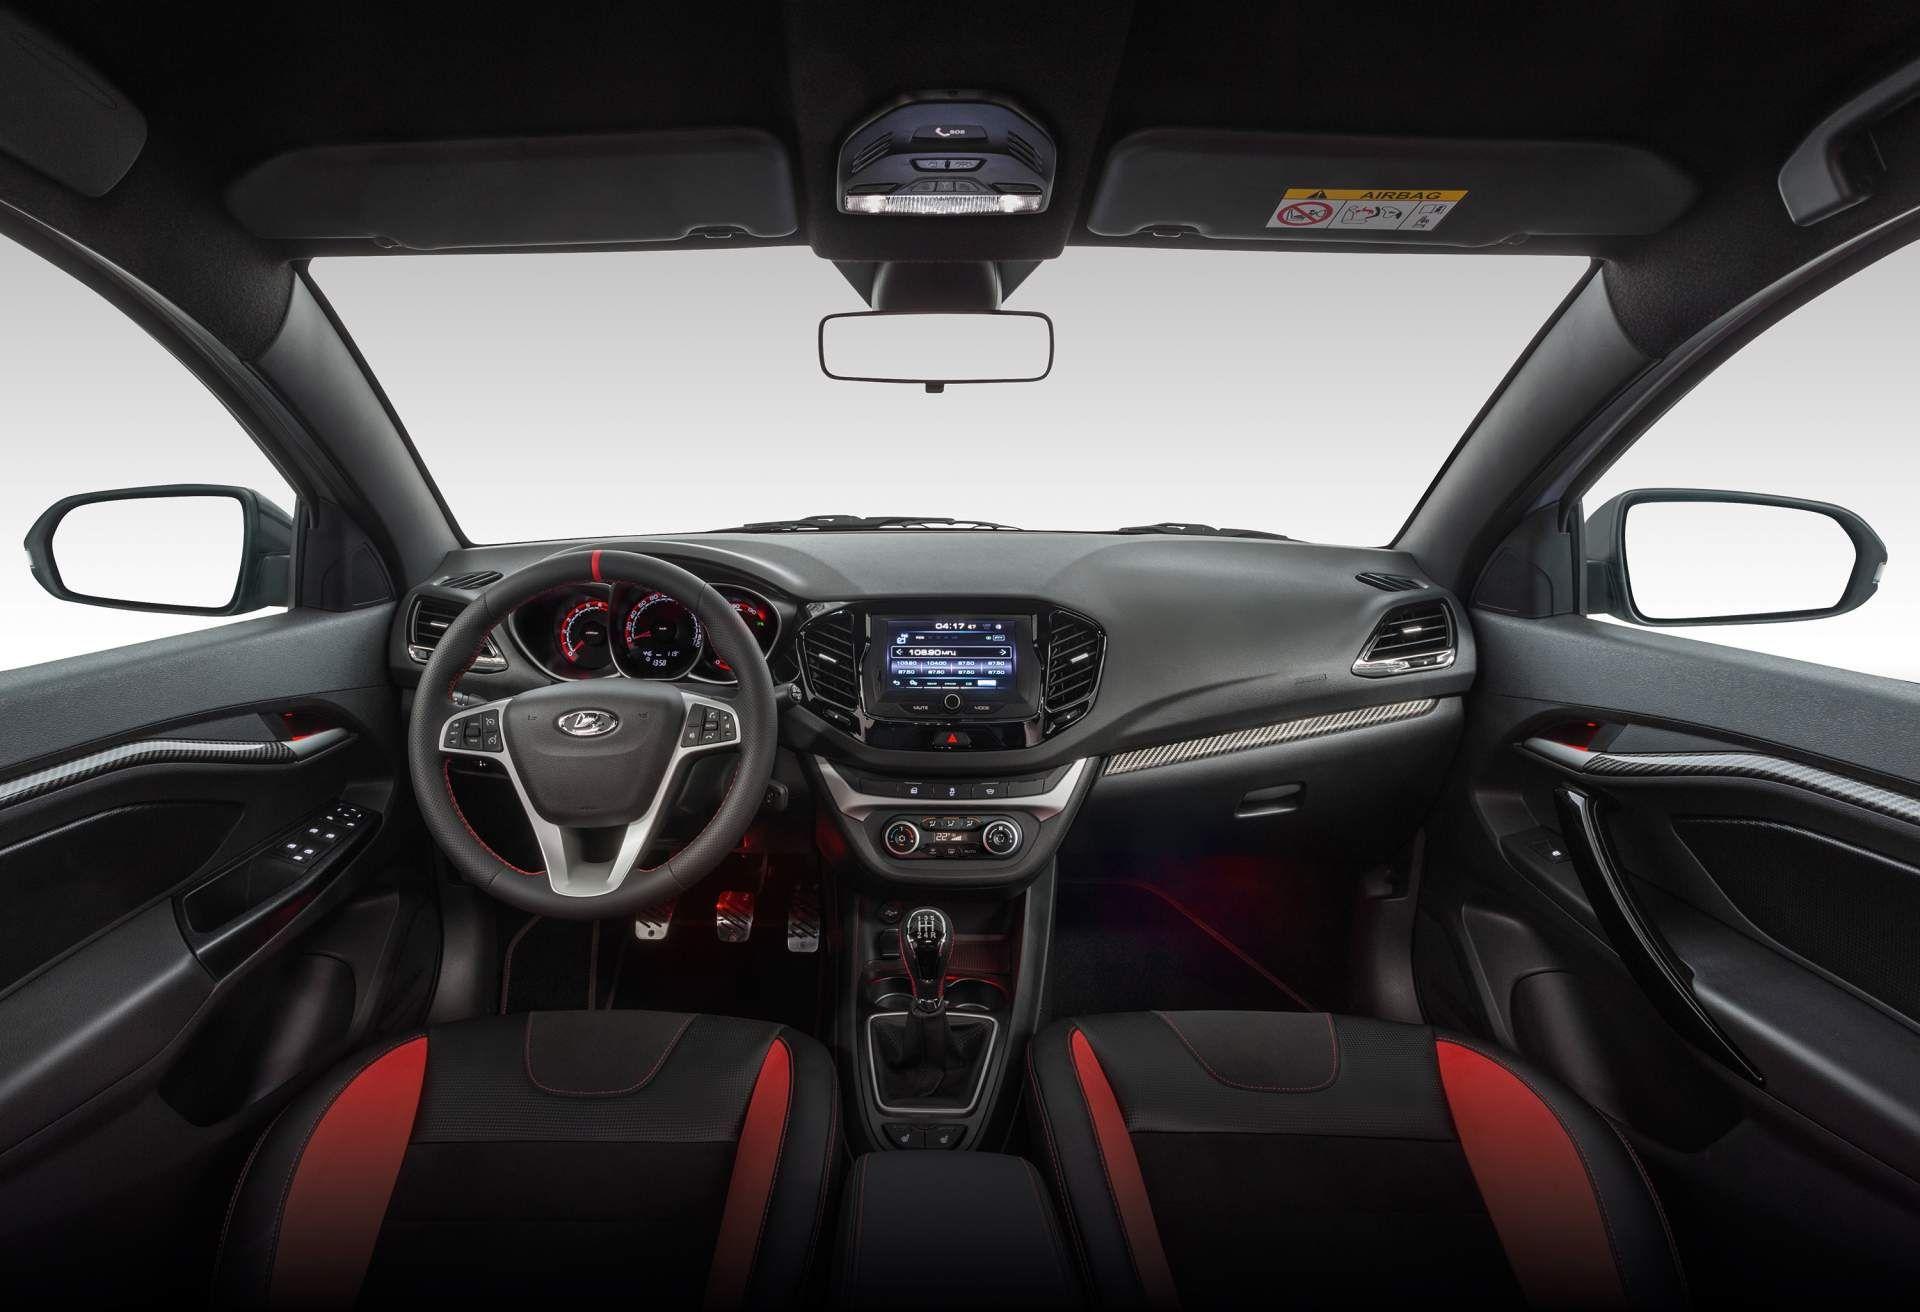 145 Ps Lada Vesta Sport Debuts As Russia S Budget Sports Sedan